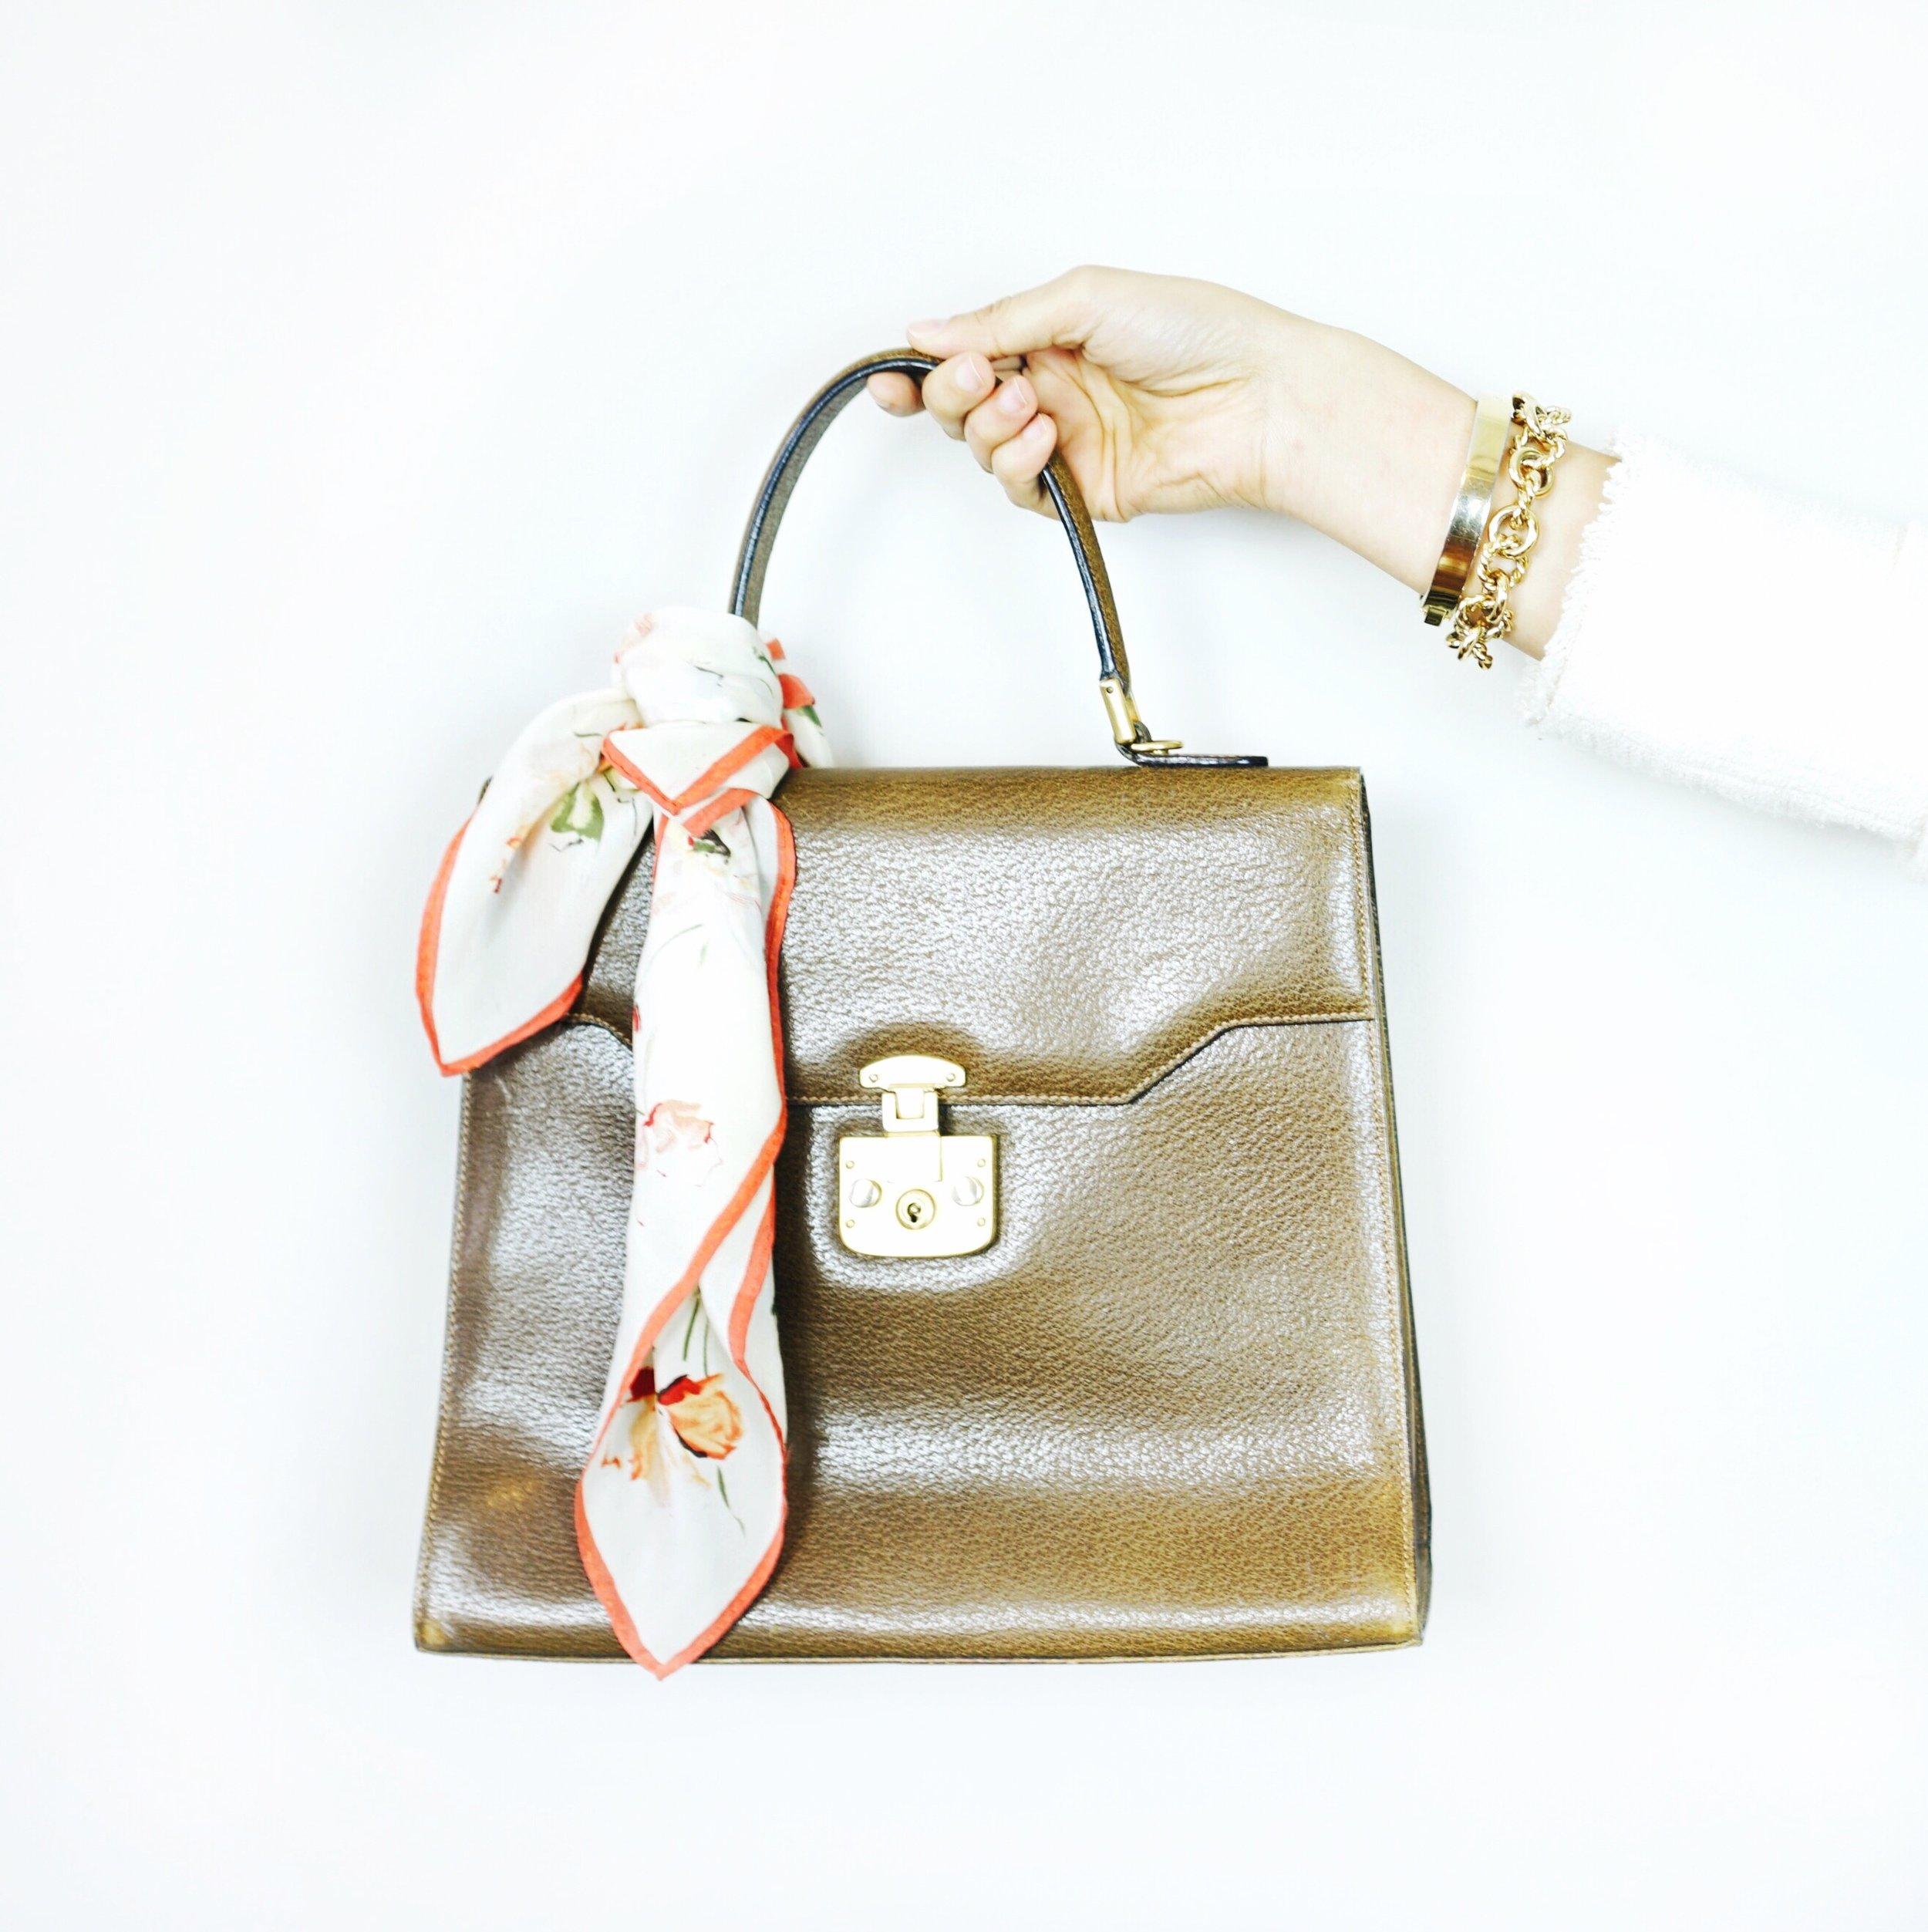 gucci-purse-ralph-lauren-floral-scarf.JPG